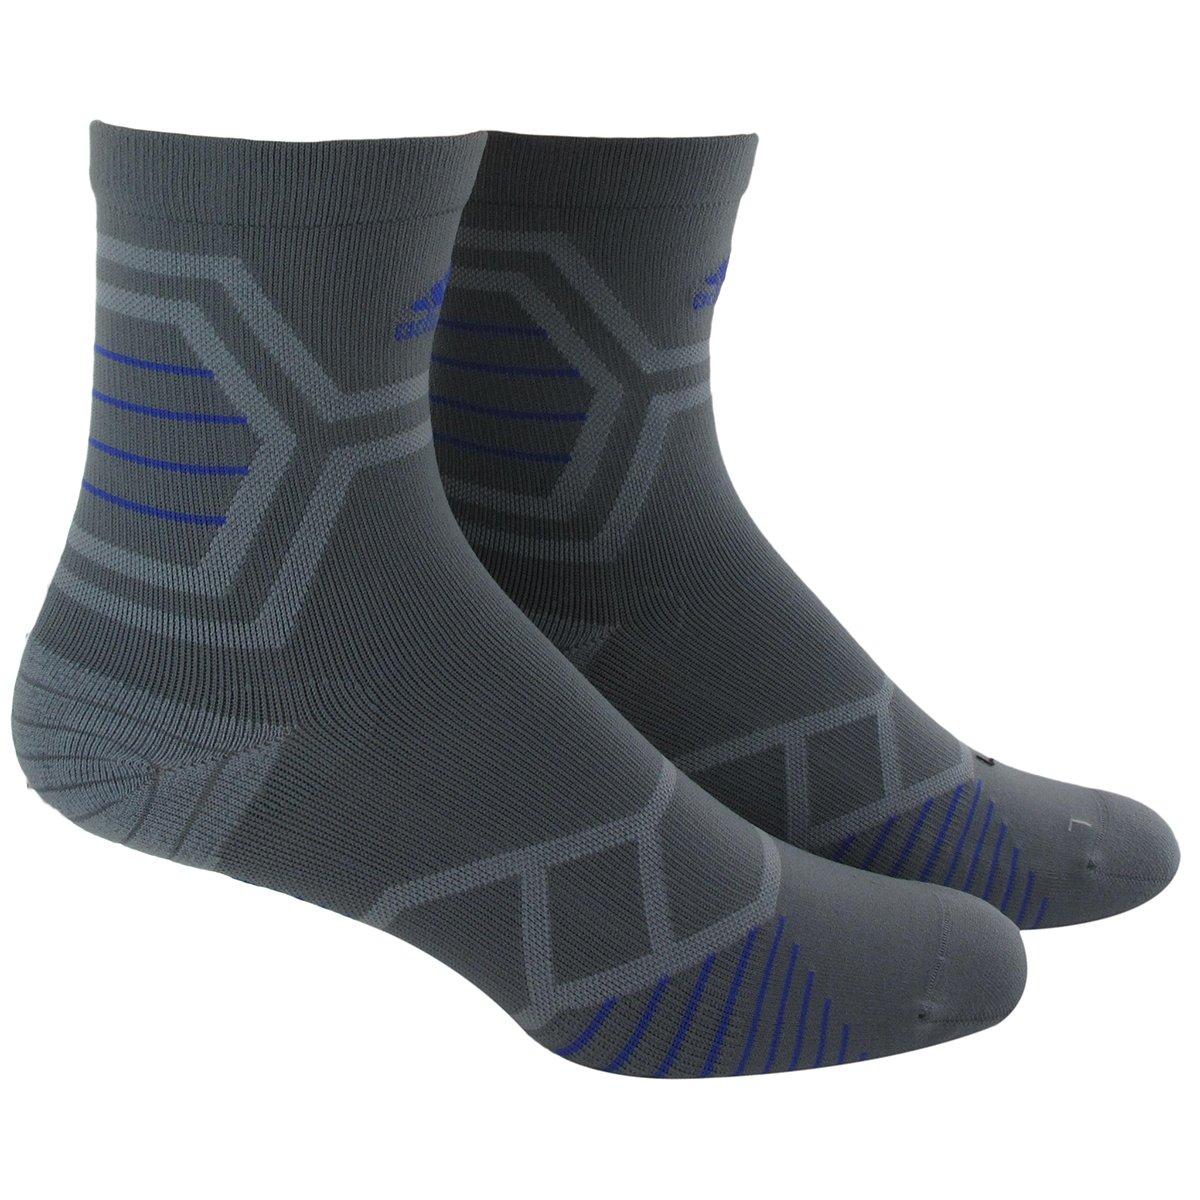 Agron calcetines unisex calcetines de energía Running mid-crew único